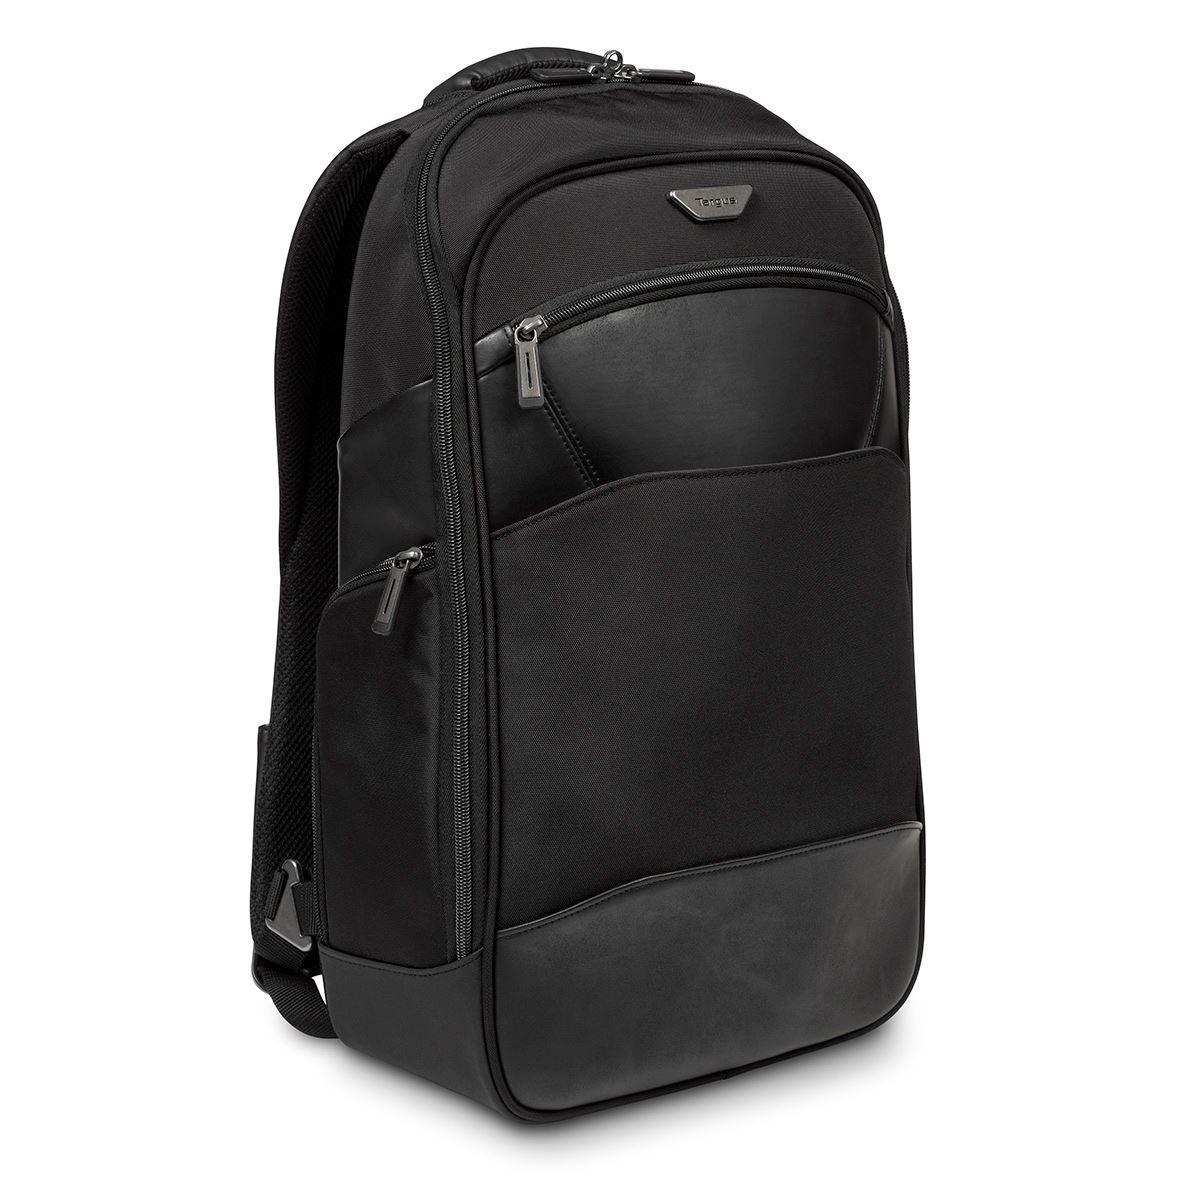 "Mobile VIP 12 12.5 13 13.3 14 15 & 15.6"" Laptop Backpack – Black"